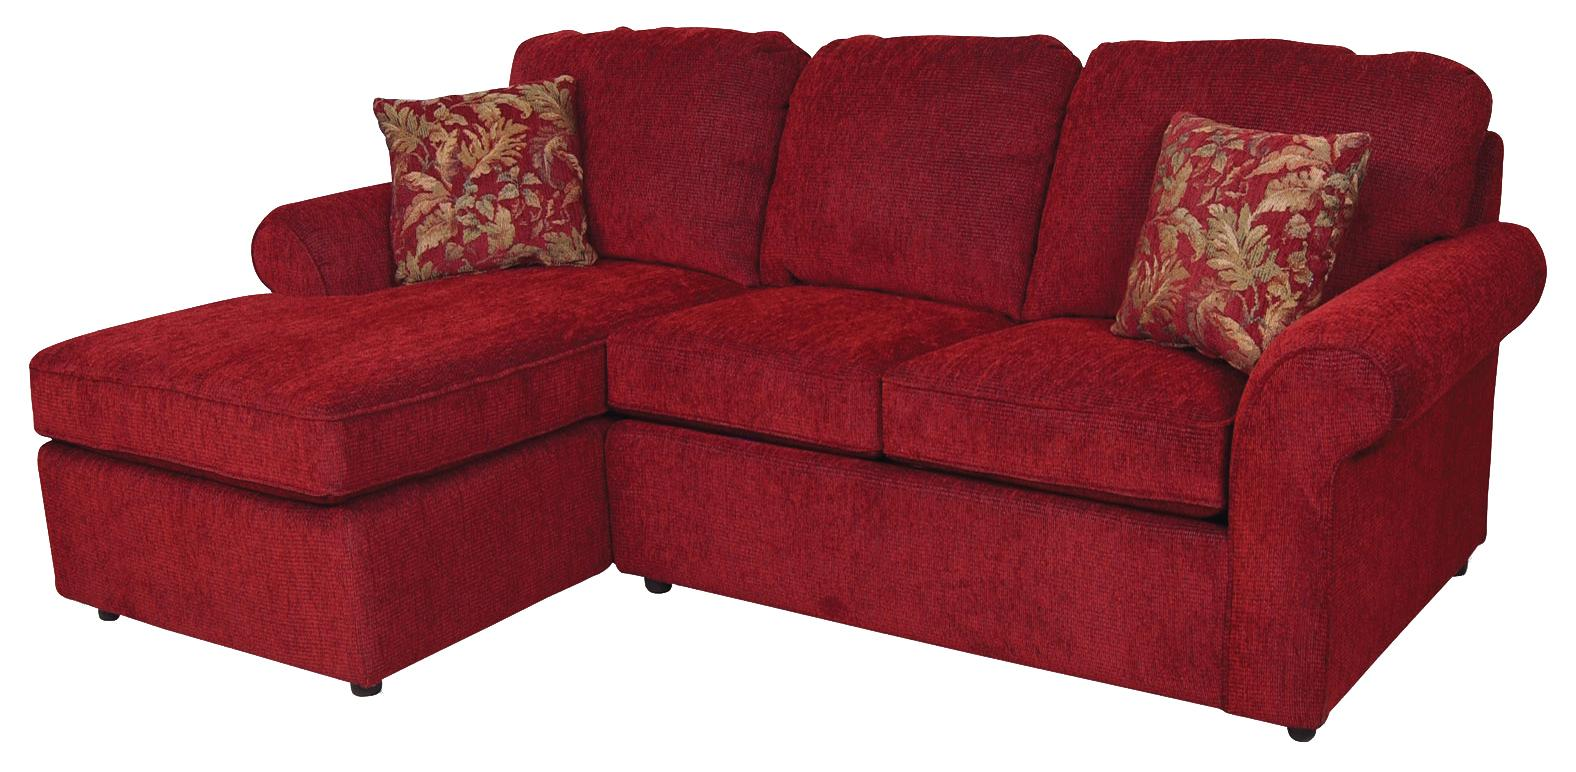 England Malibu 3 Seat Left Side Chaise Sofa Vandrie